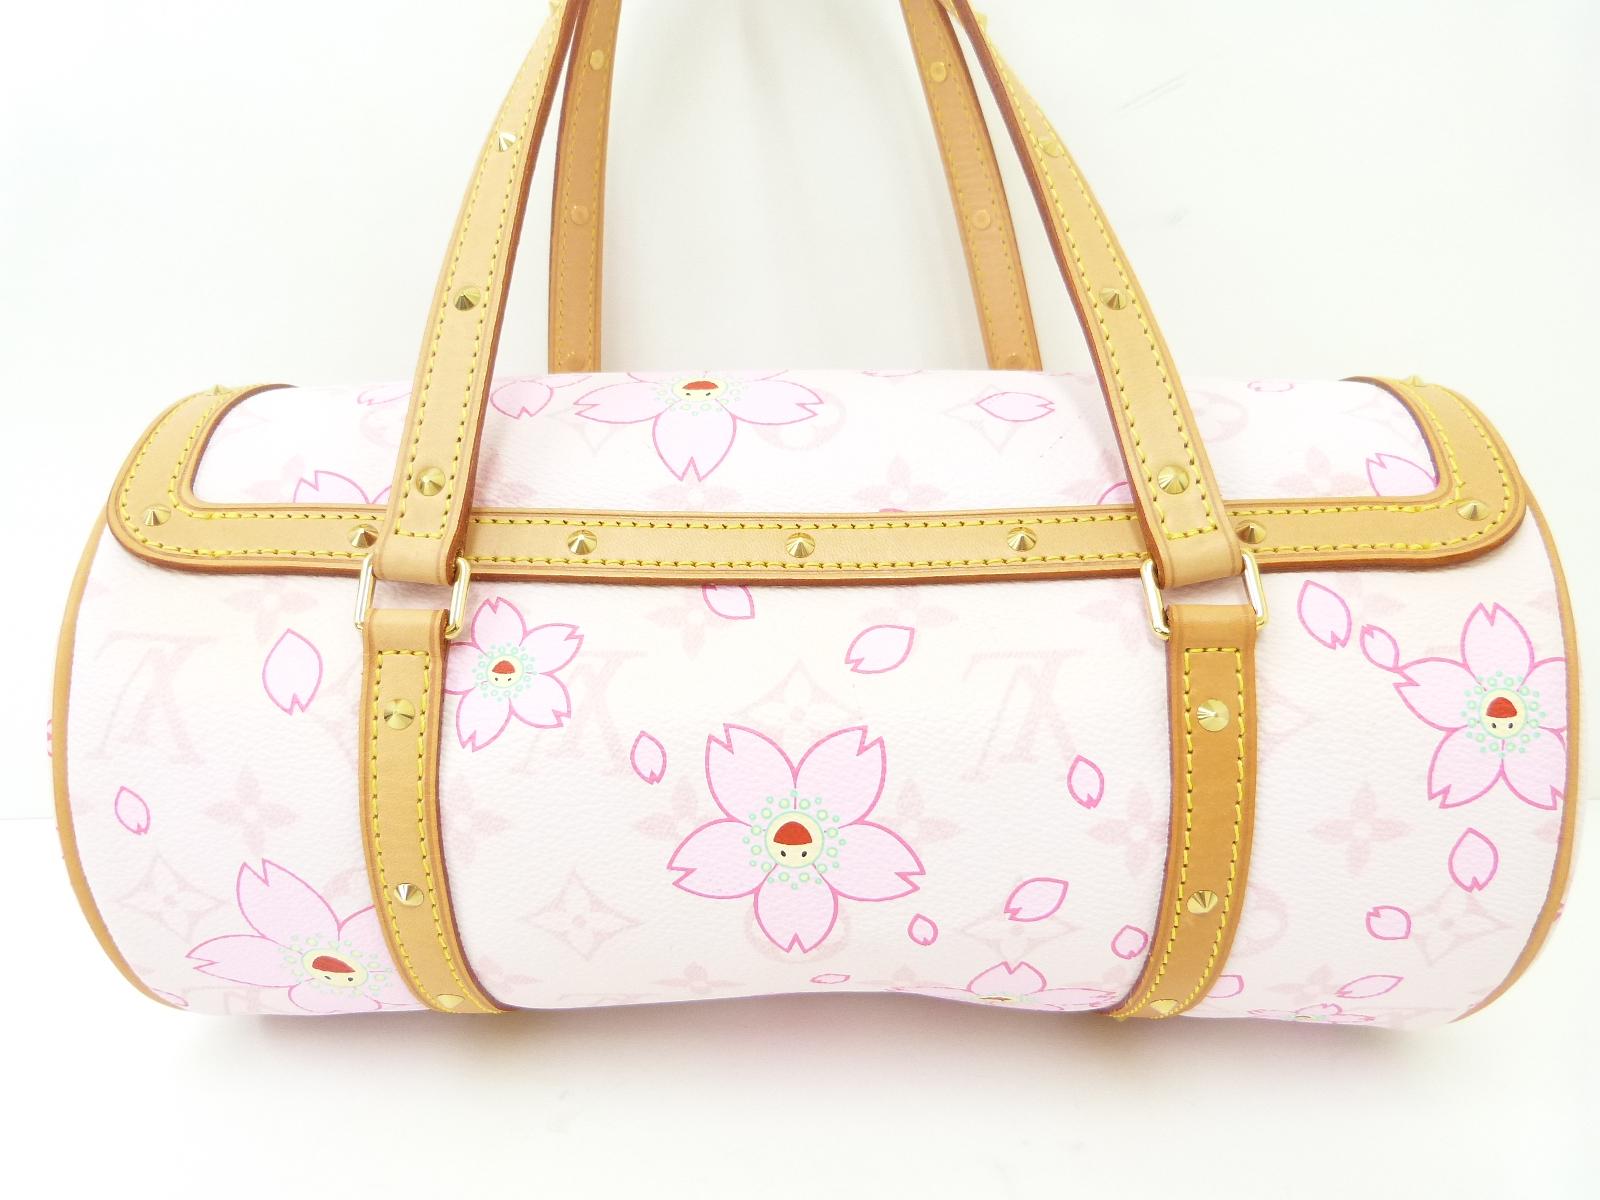 Louis vuitton takashi murakami jpg 1600x1200 Cherry blossom murakami 5ddef7ccd48e8